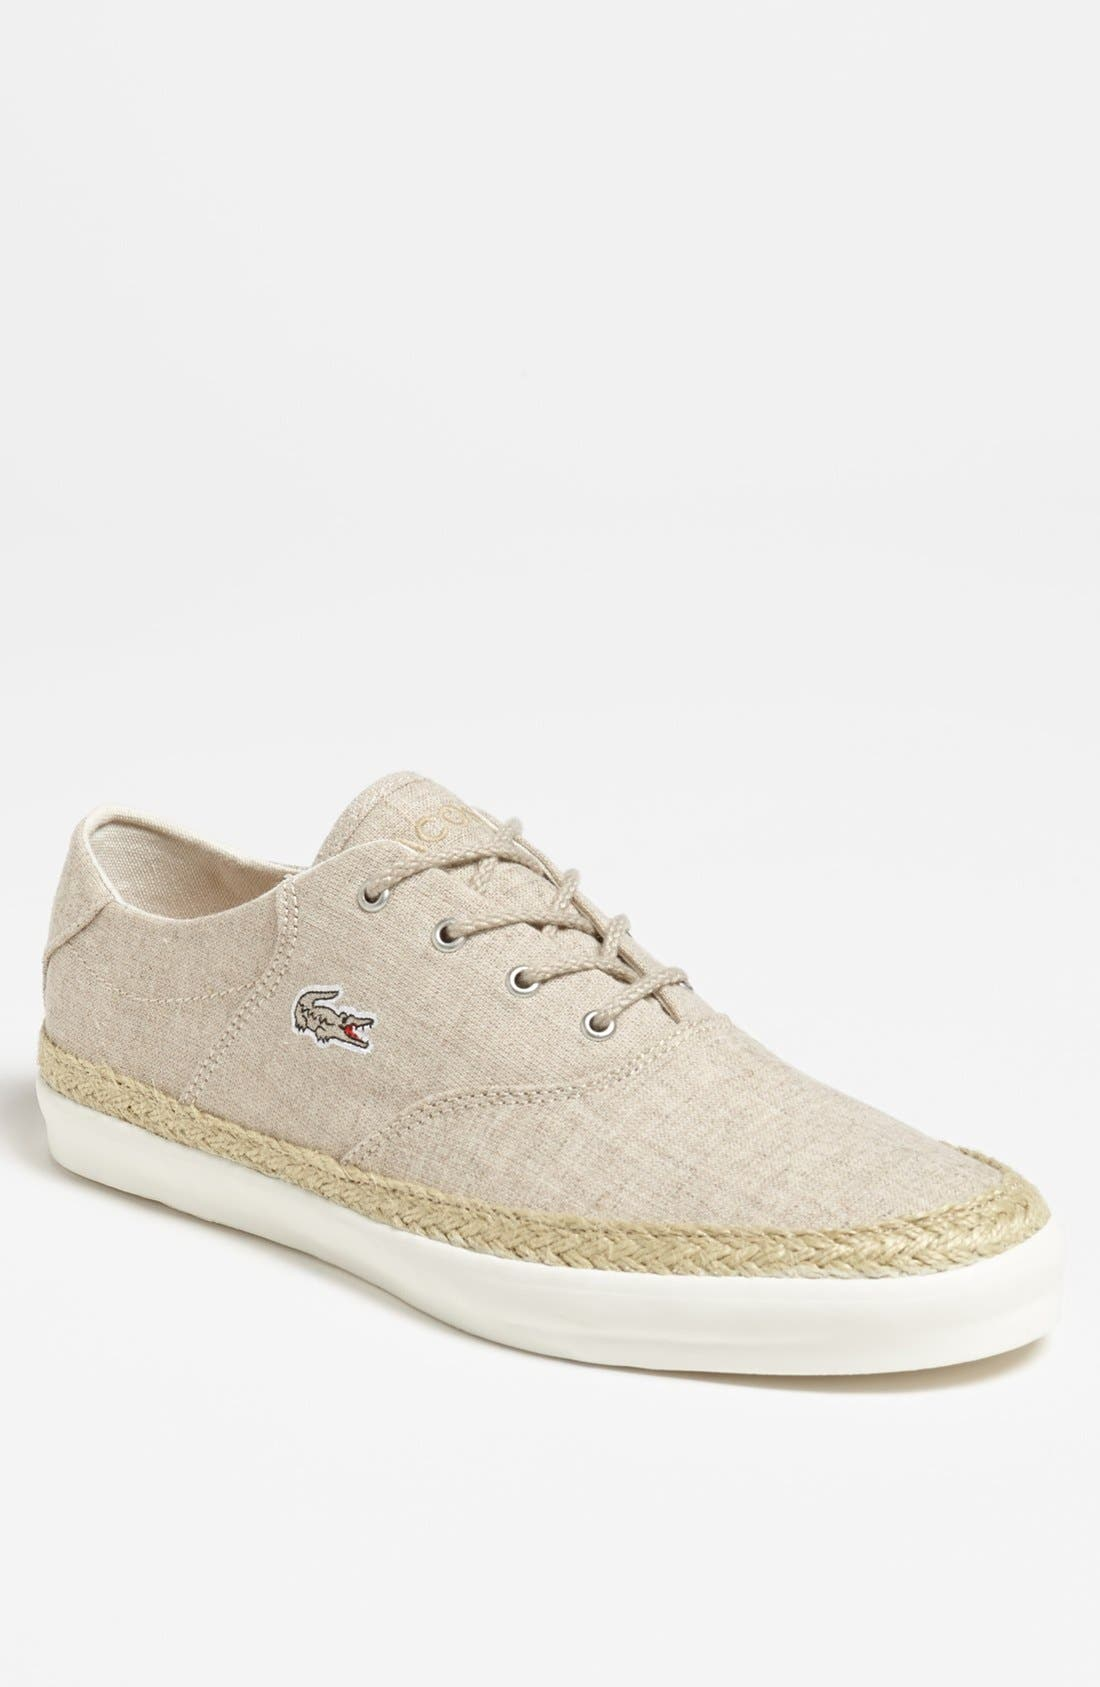 Main Image - Lacoste 'Glendon' Sneaker (Men)